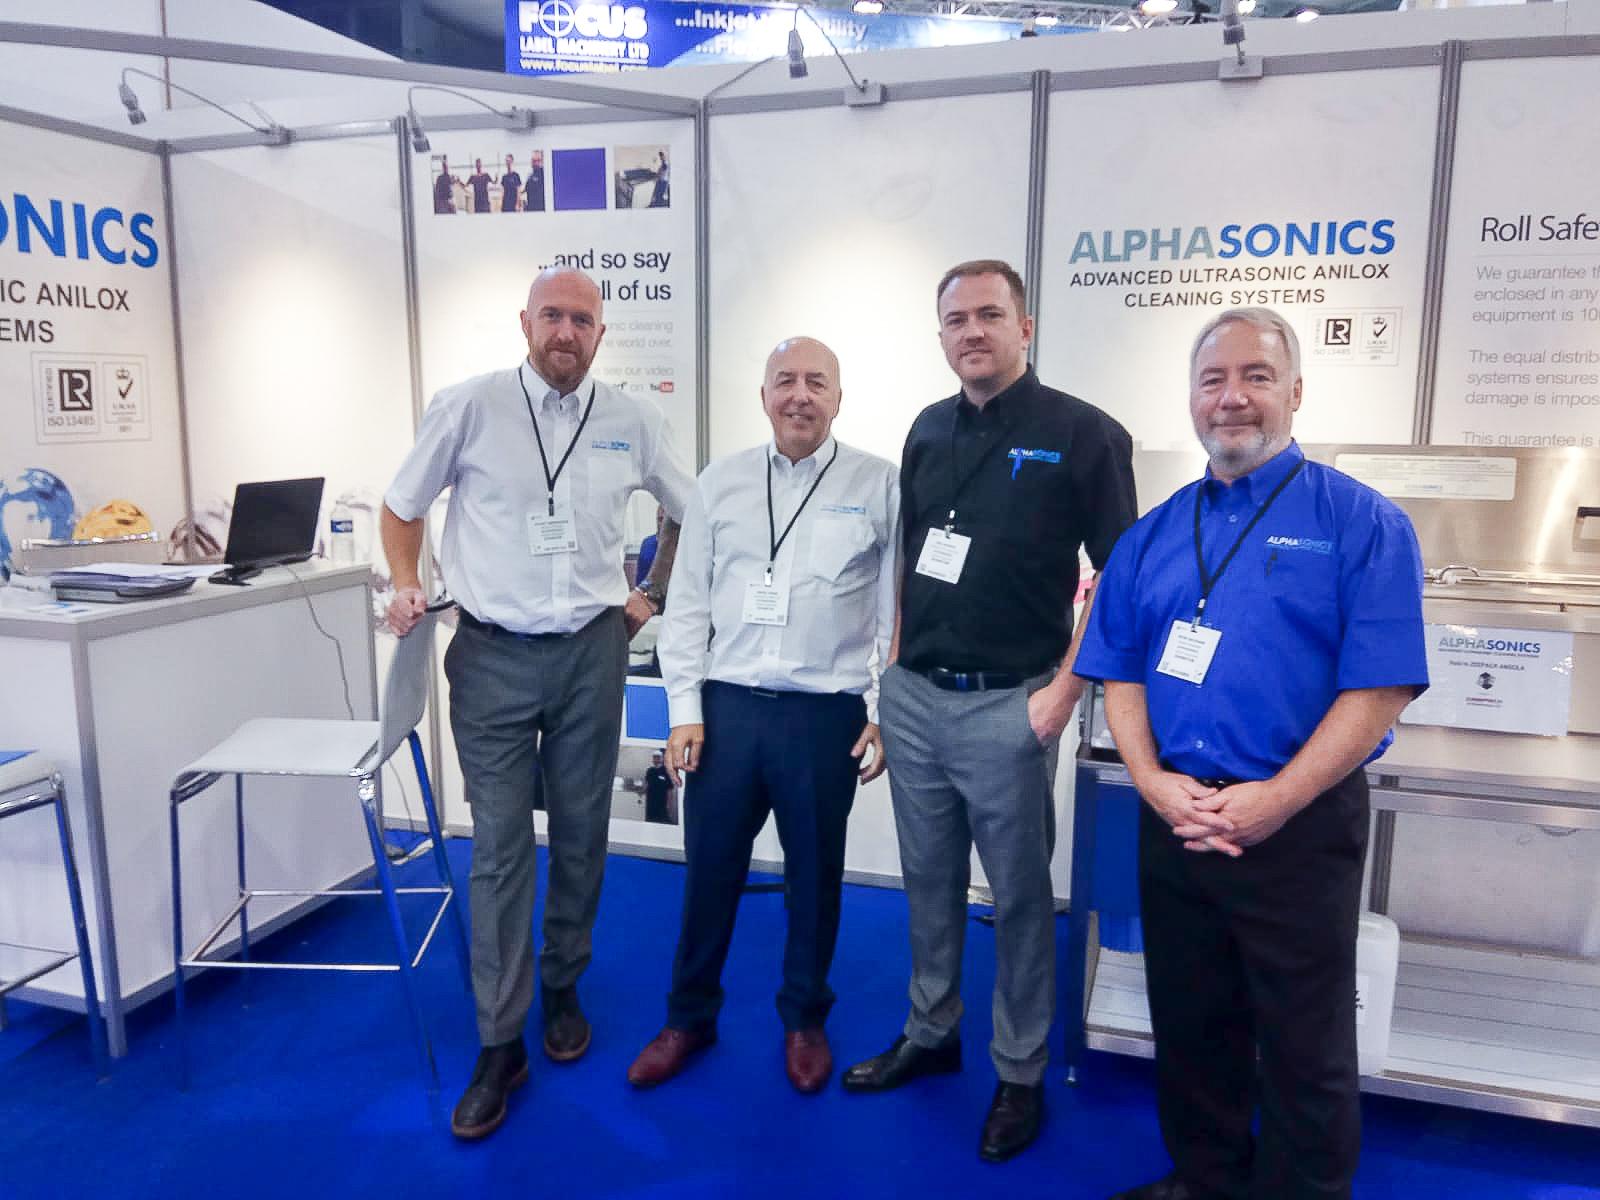 The Alphasonics UCS team exhibiting at Labelexpo 2019.